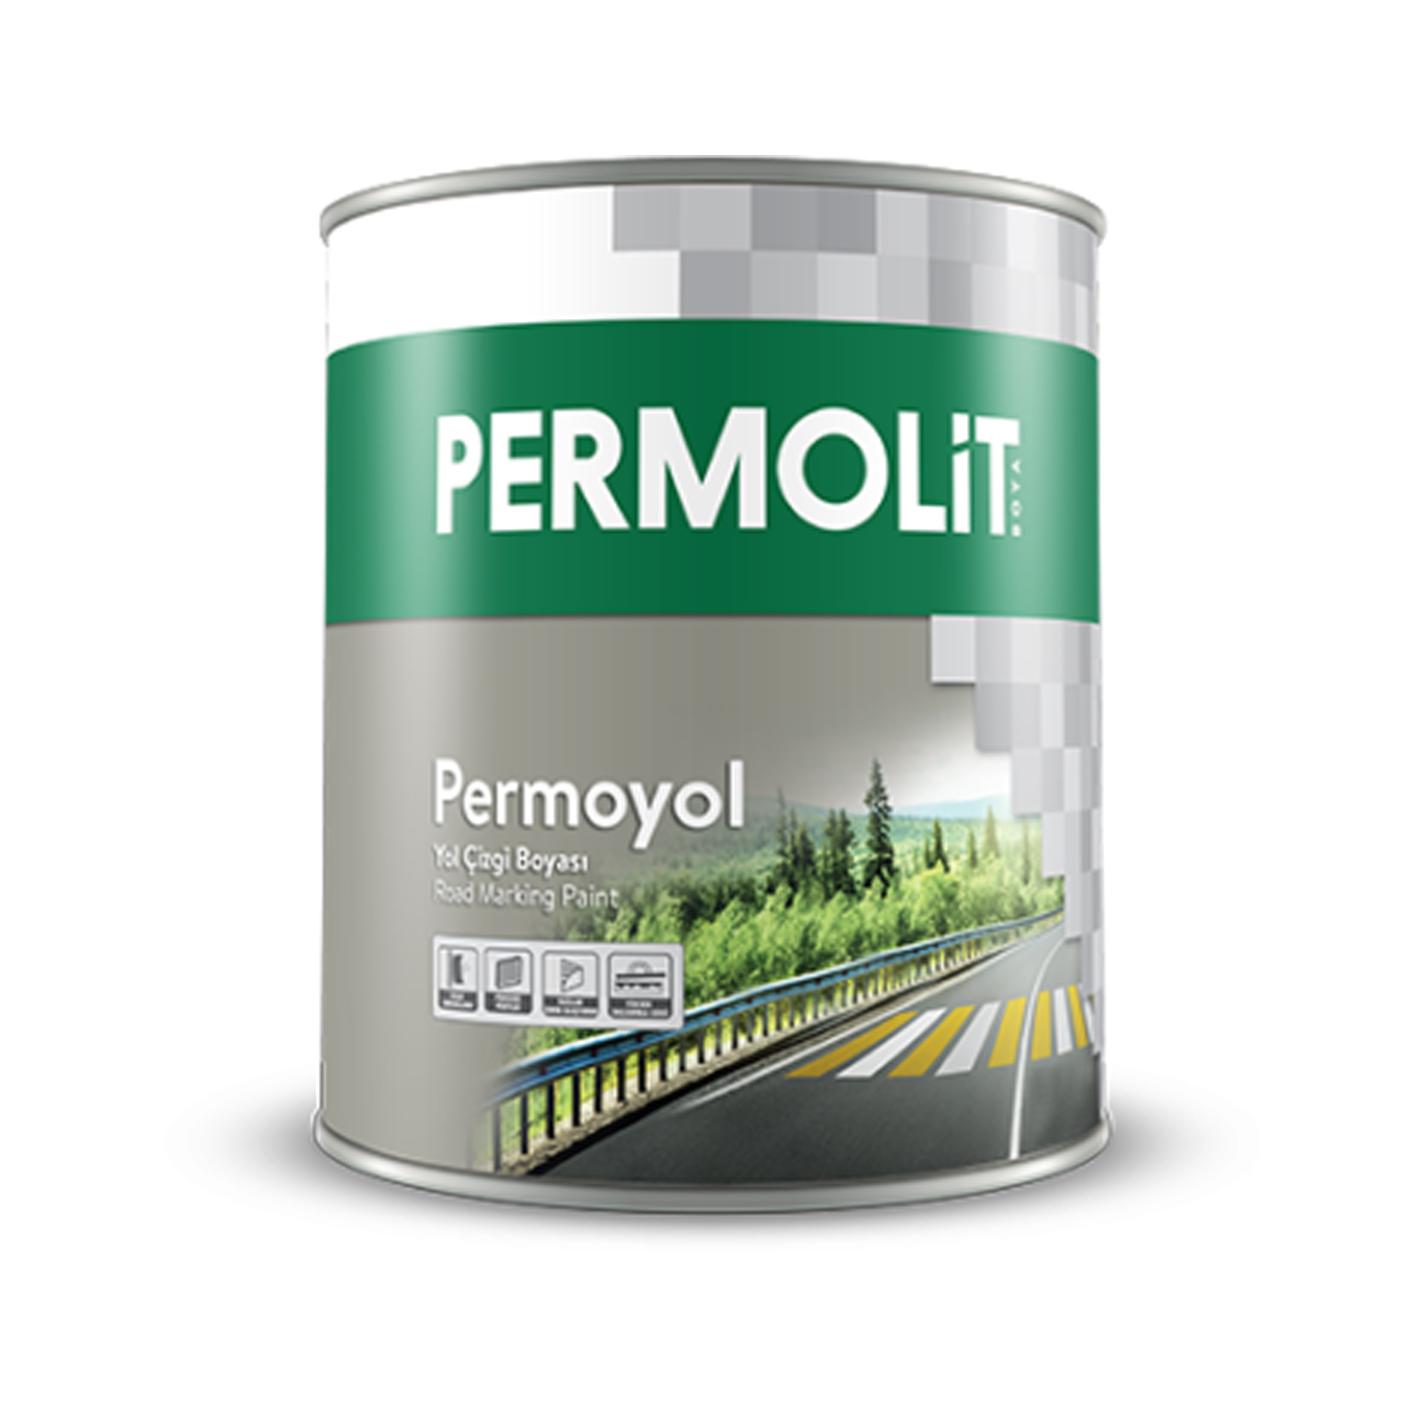 Permolit Permoyol Yol Çizgi Boyası Beyaz 3.5Kg